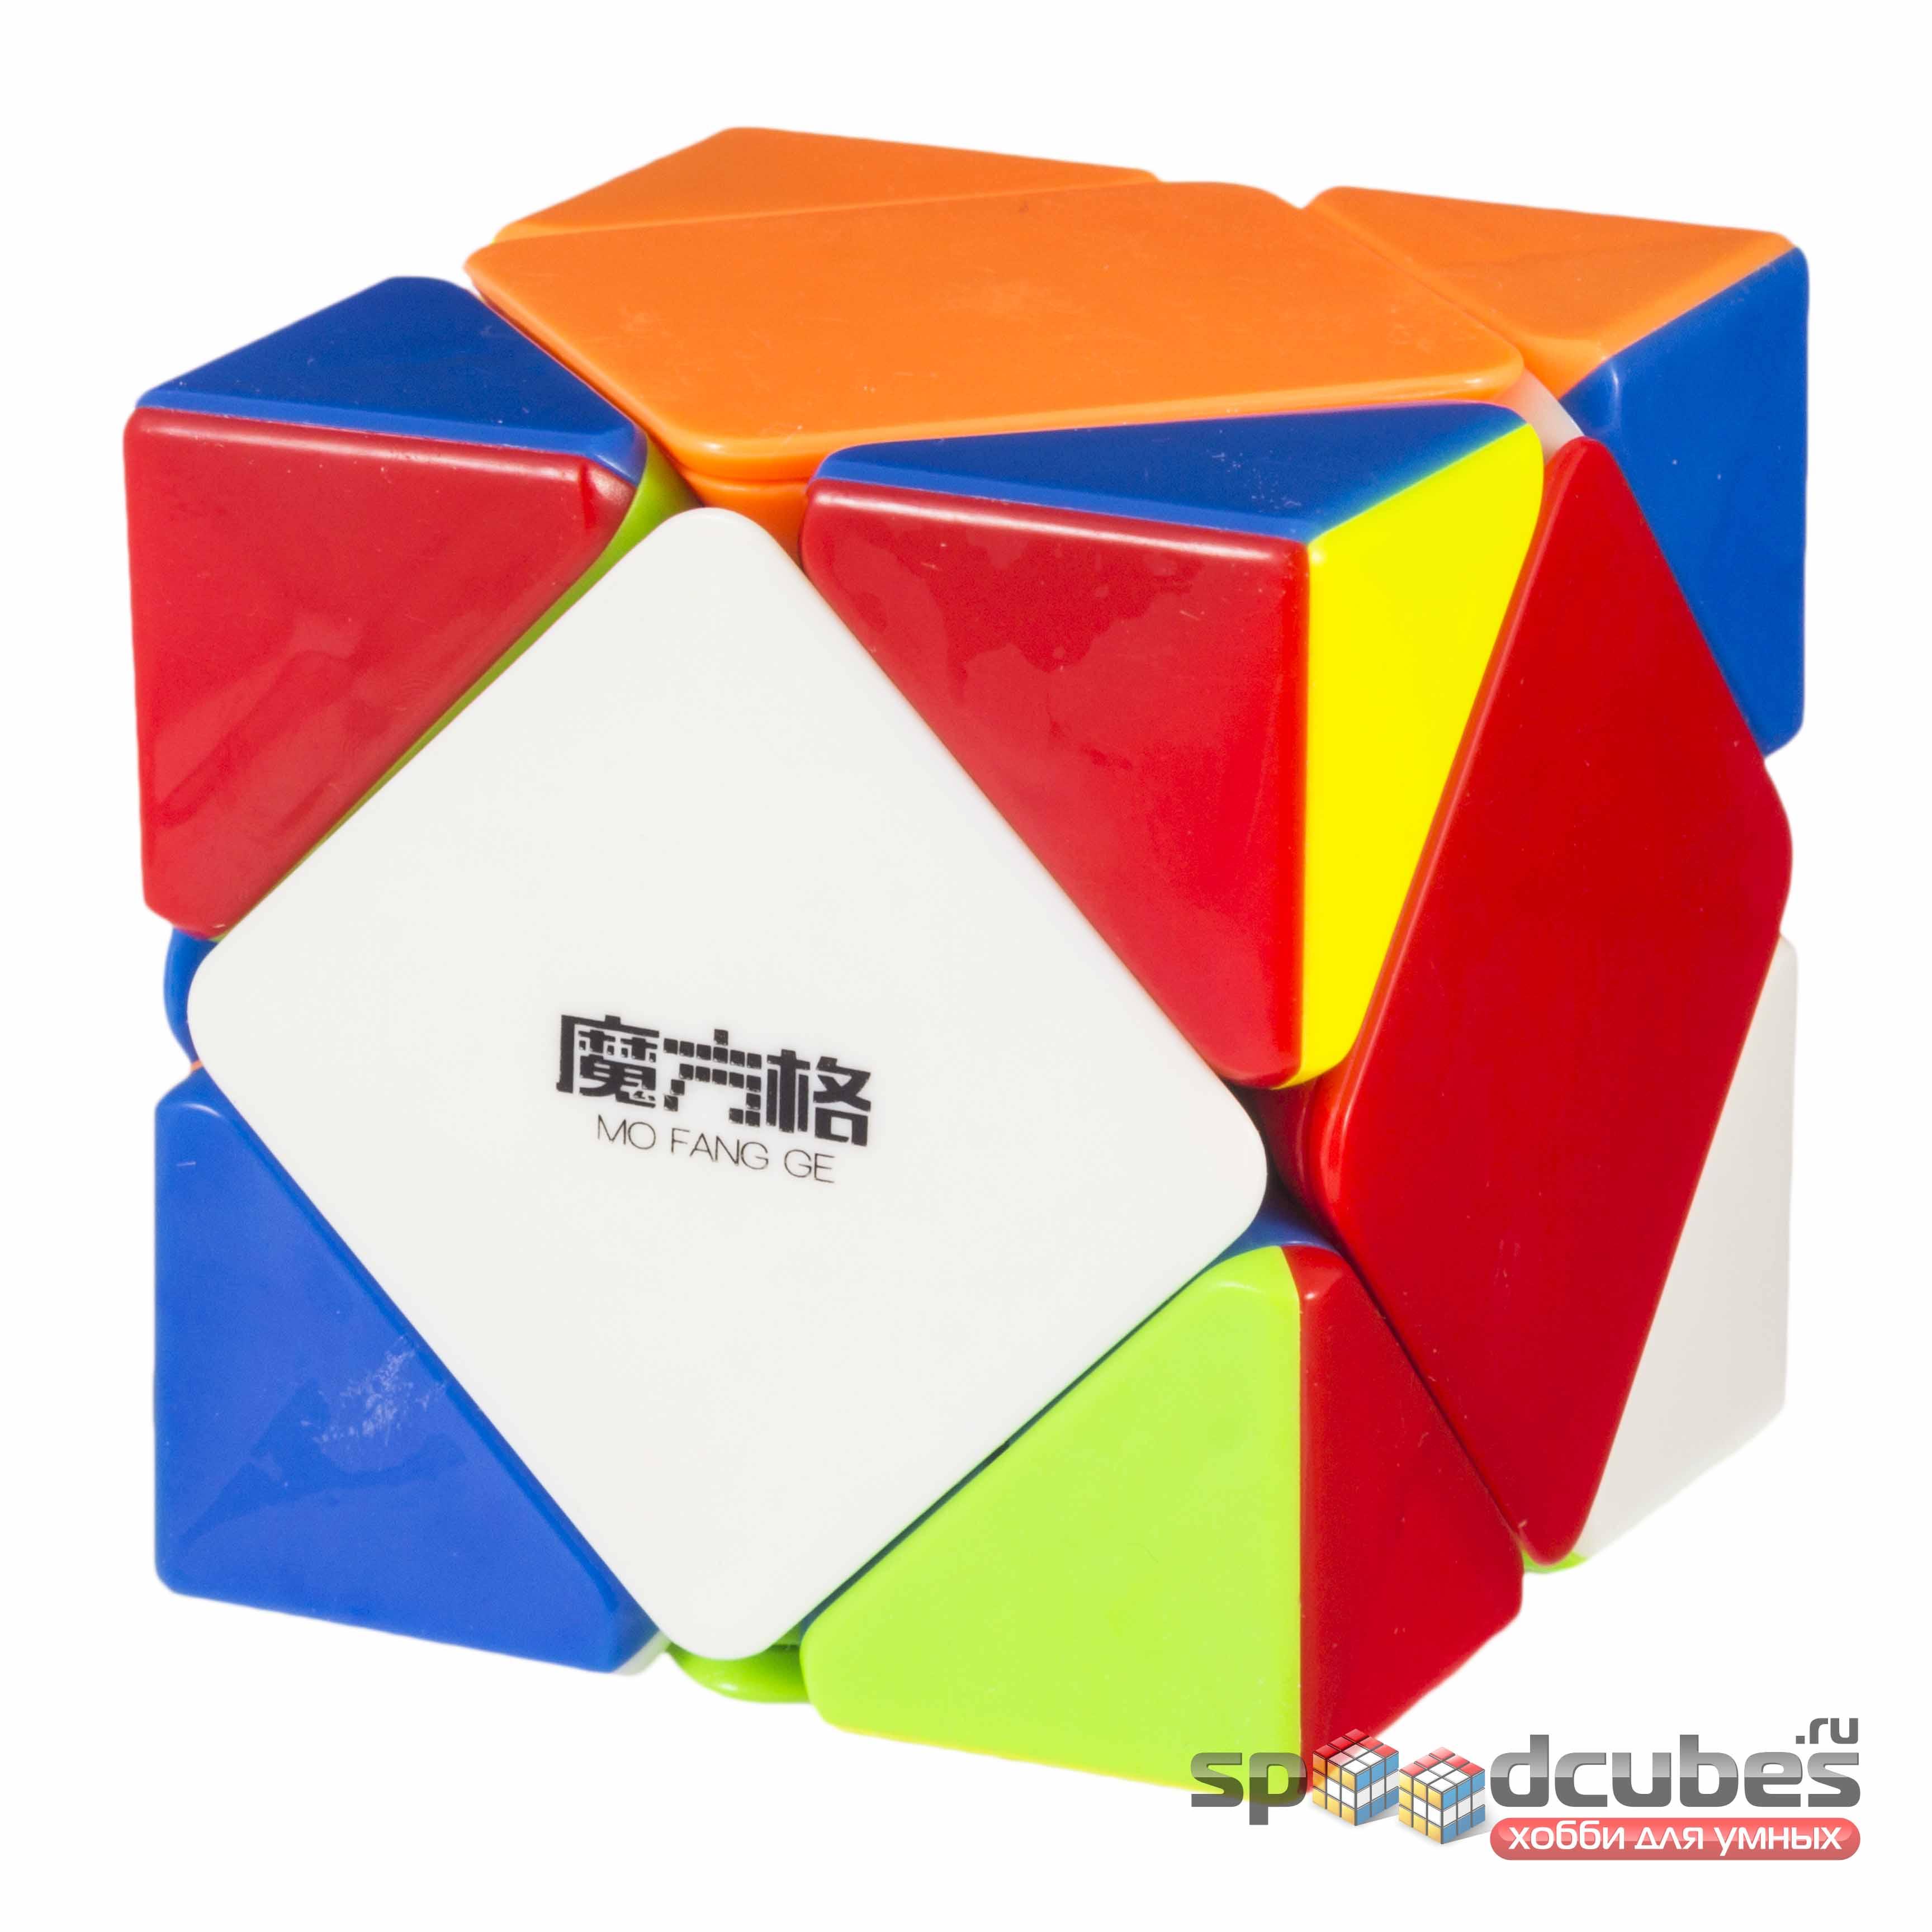 QiYi (MoFangGe) Skewb Color 3